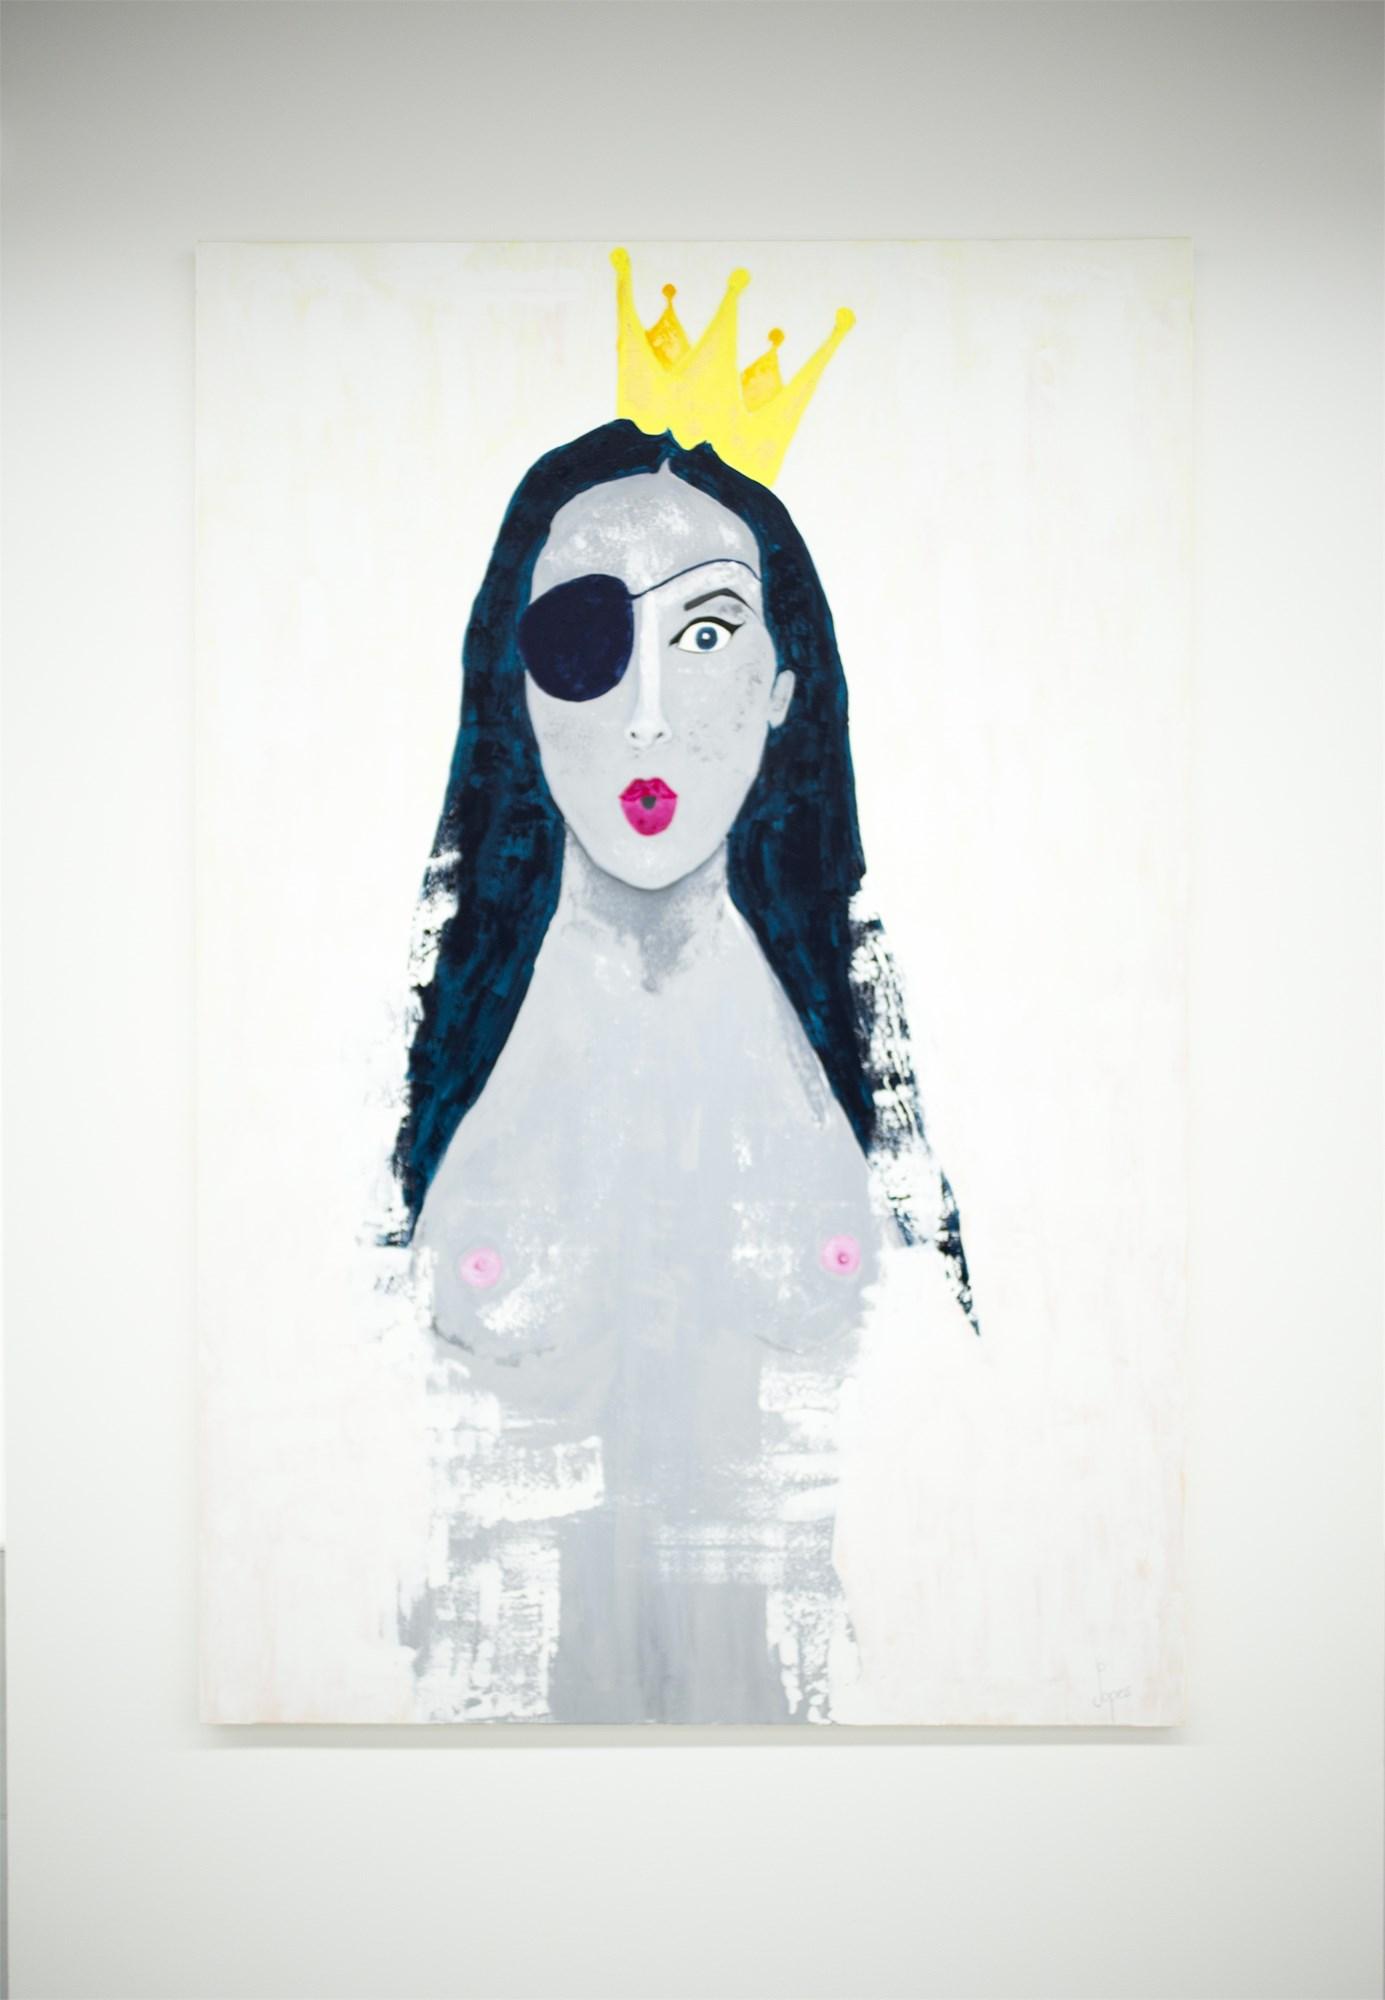 pirata de coroa princesa de pala por joana lopes obra de arte